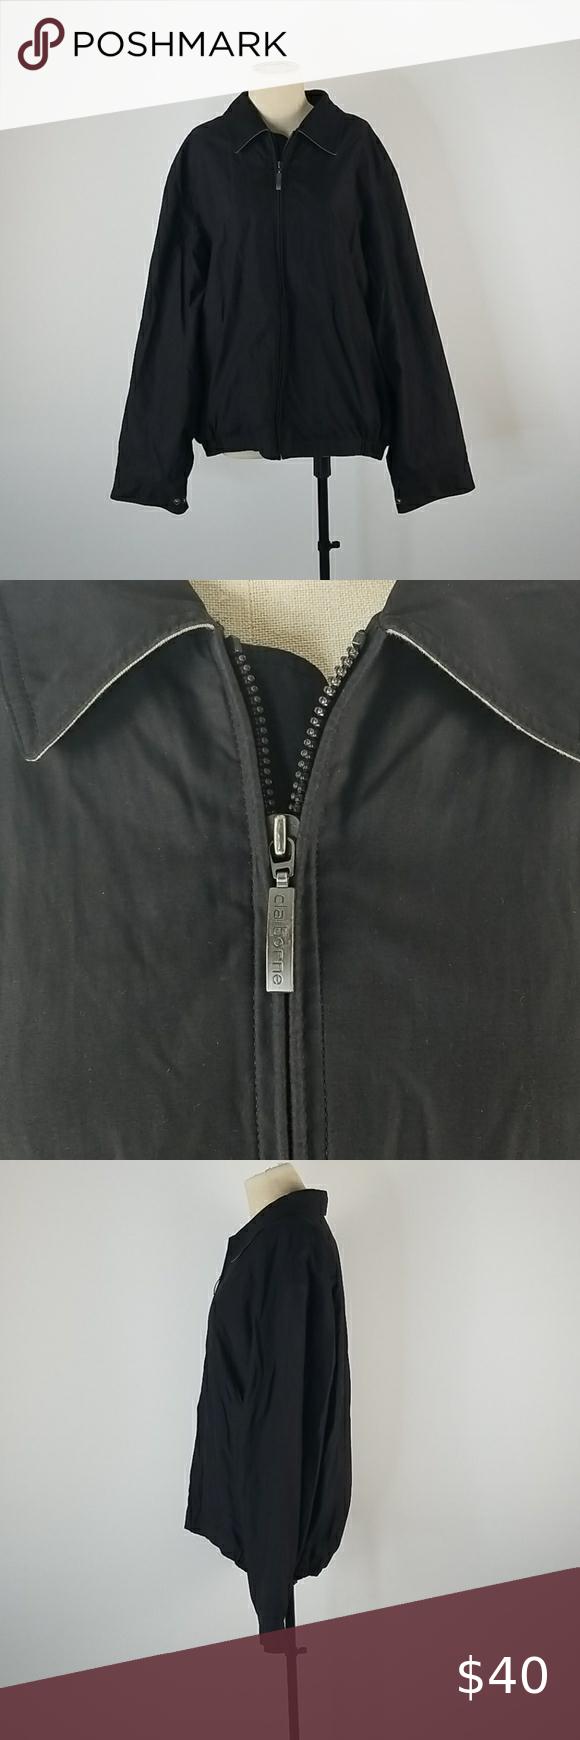 Claiborne Outerwear Sports Rain Jacket Black And White Scarf Clothes Design Wool Blend Jacket [ 1740 x 580 Pixel ]